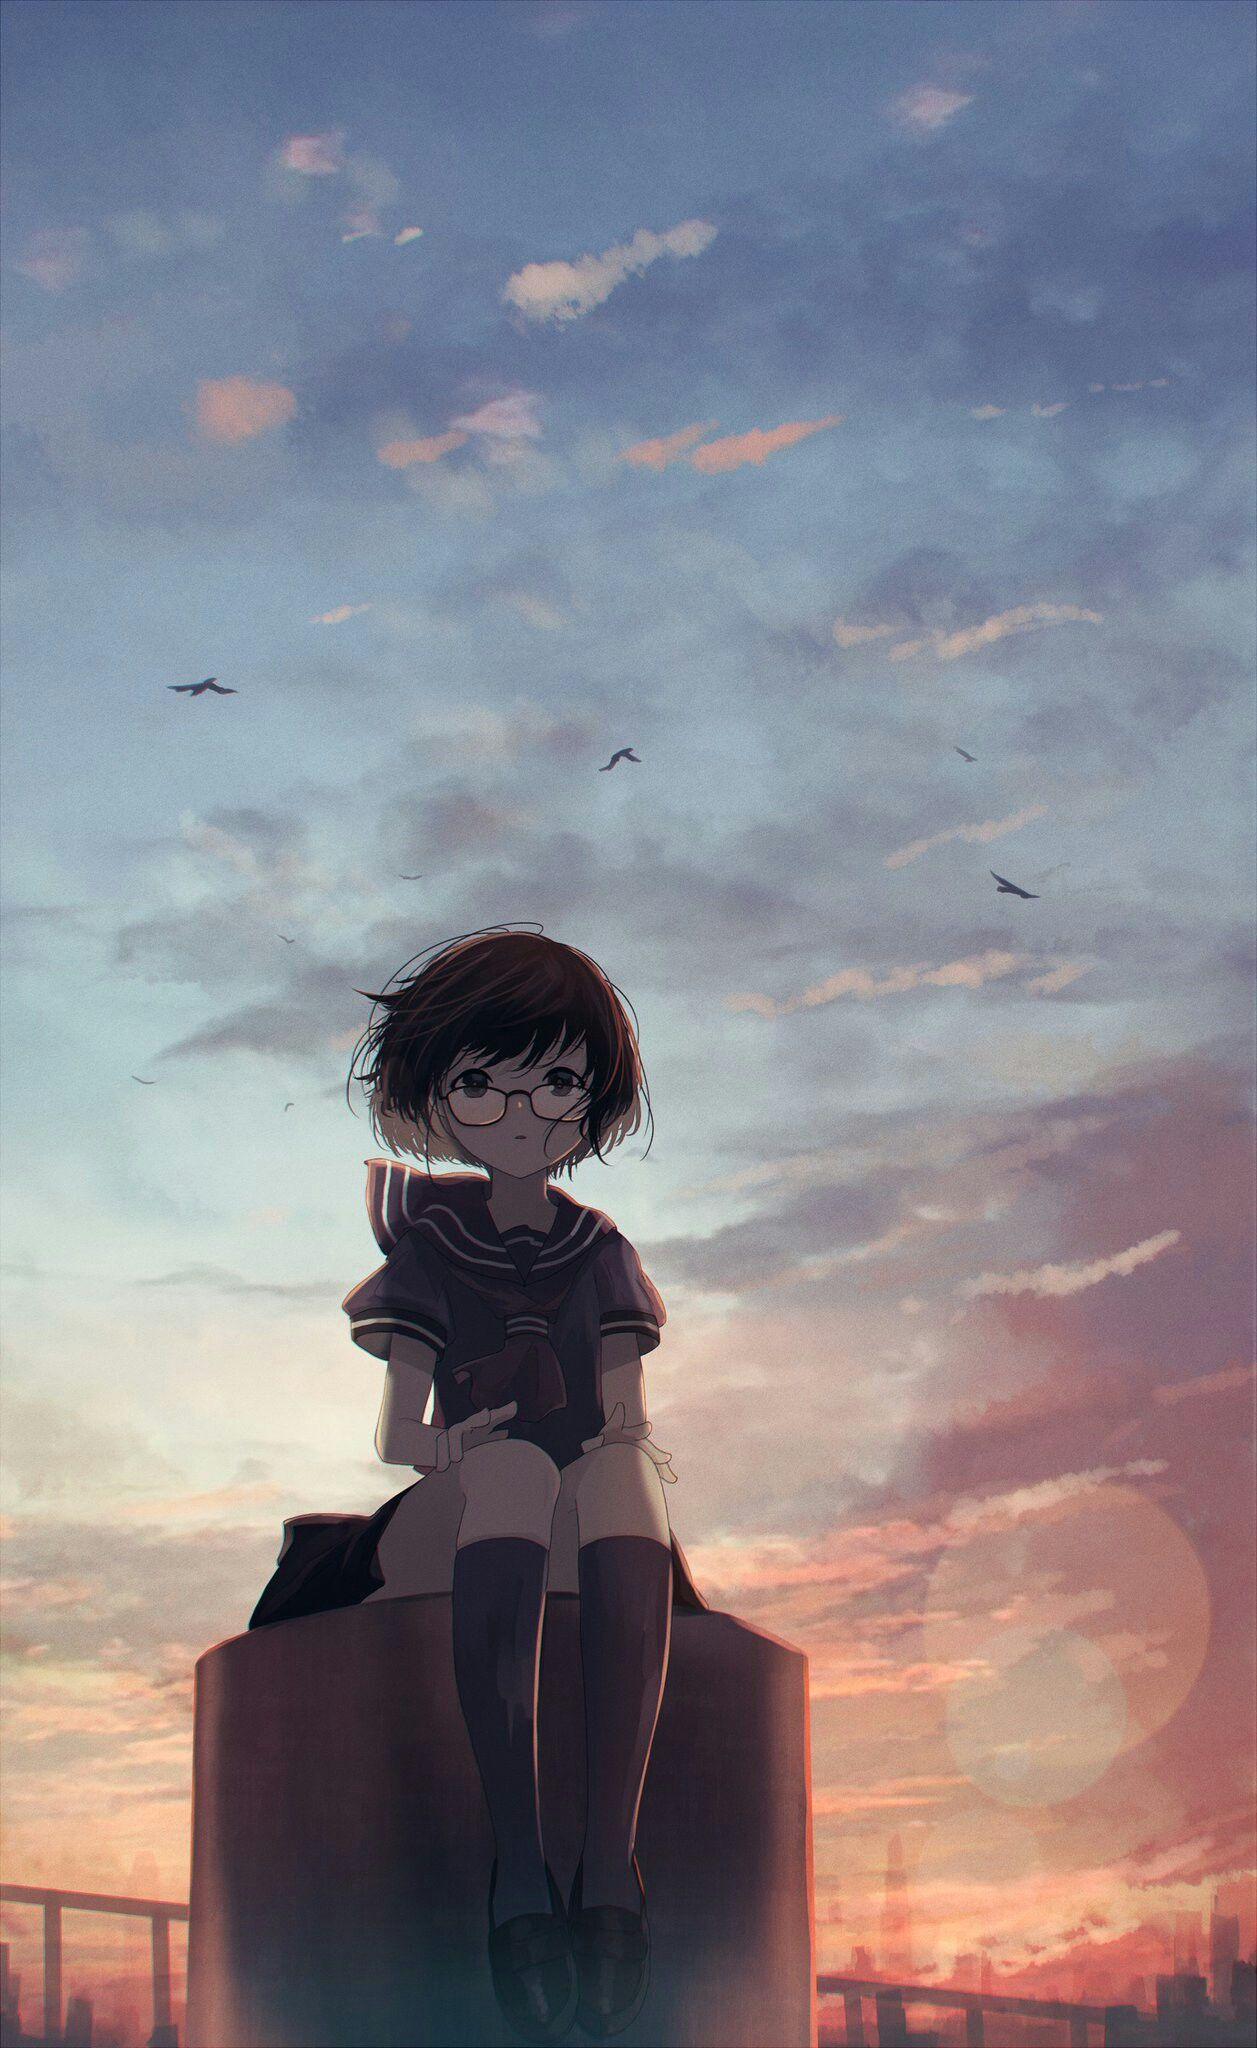 Anime Wallpaper Animewallpapers Animegirl Kurdishotaku Kawaii Art خلفيات أنمي بنات Ilustrasi Ilustrasi Karakter Gambar Anime